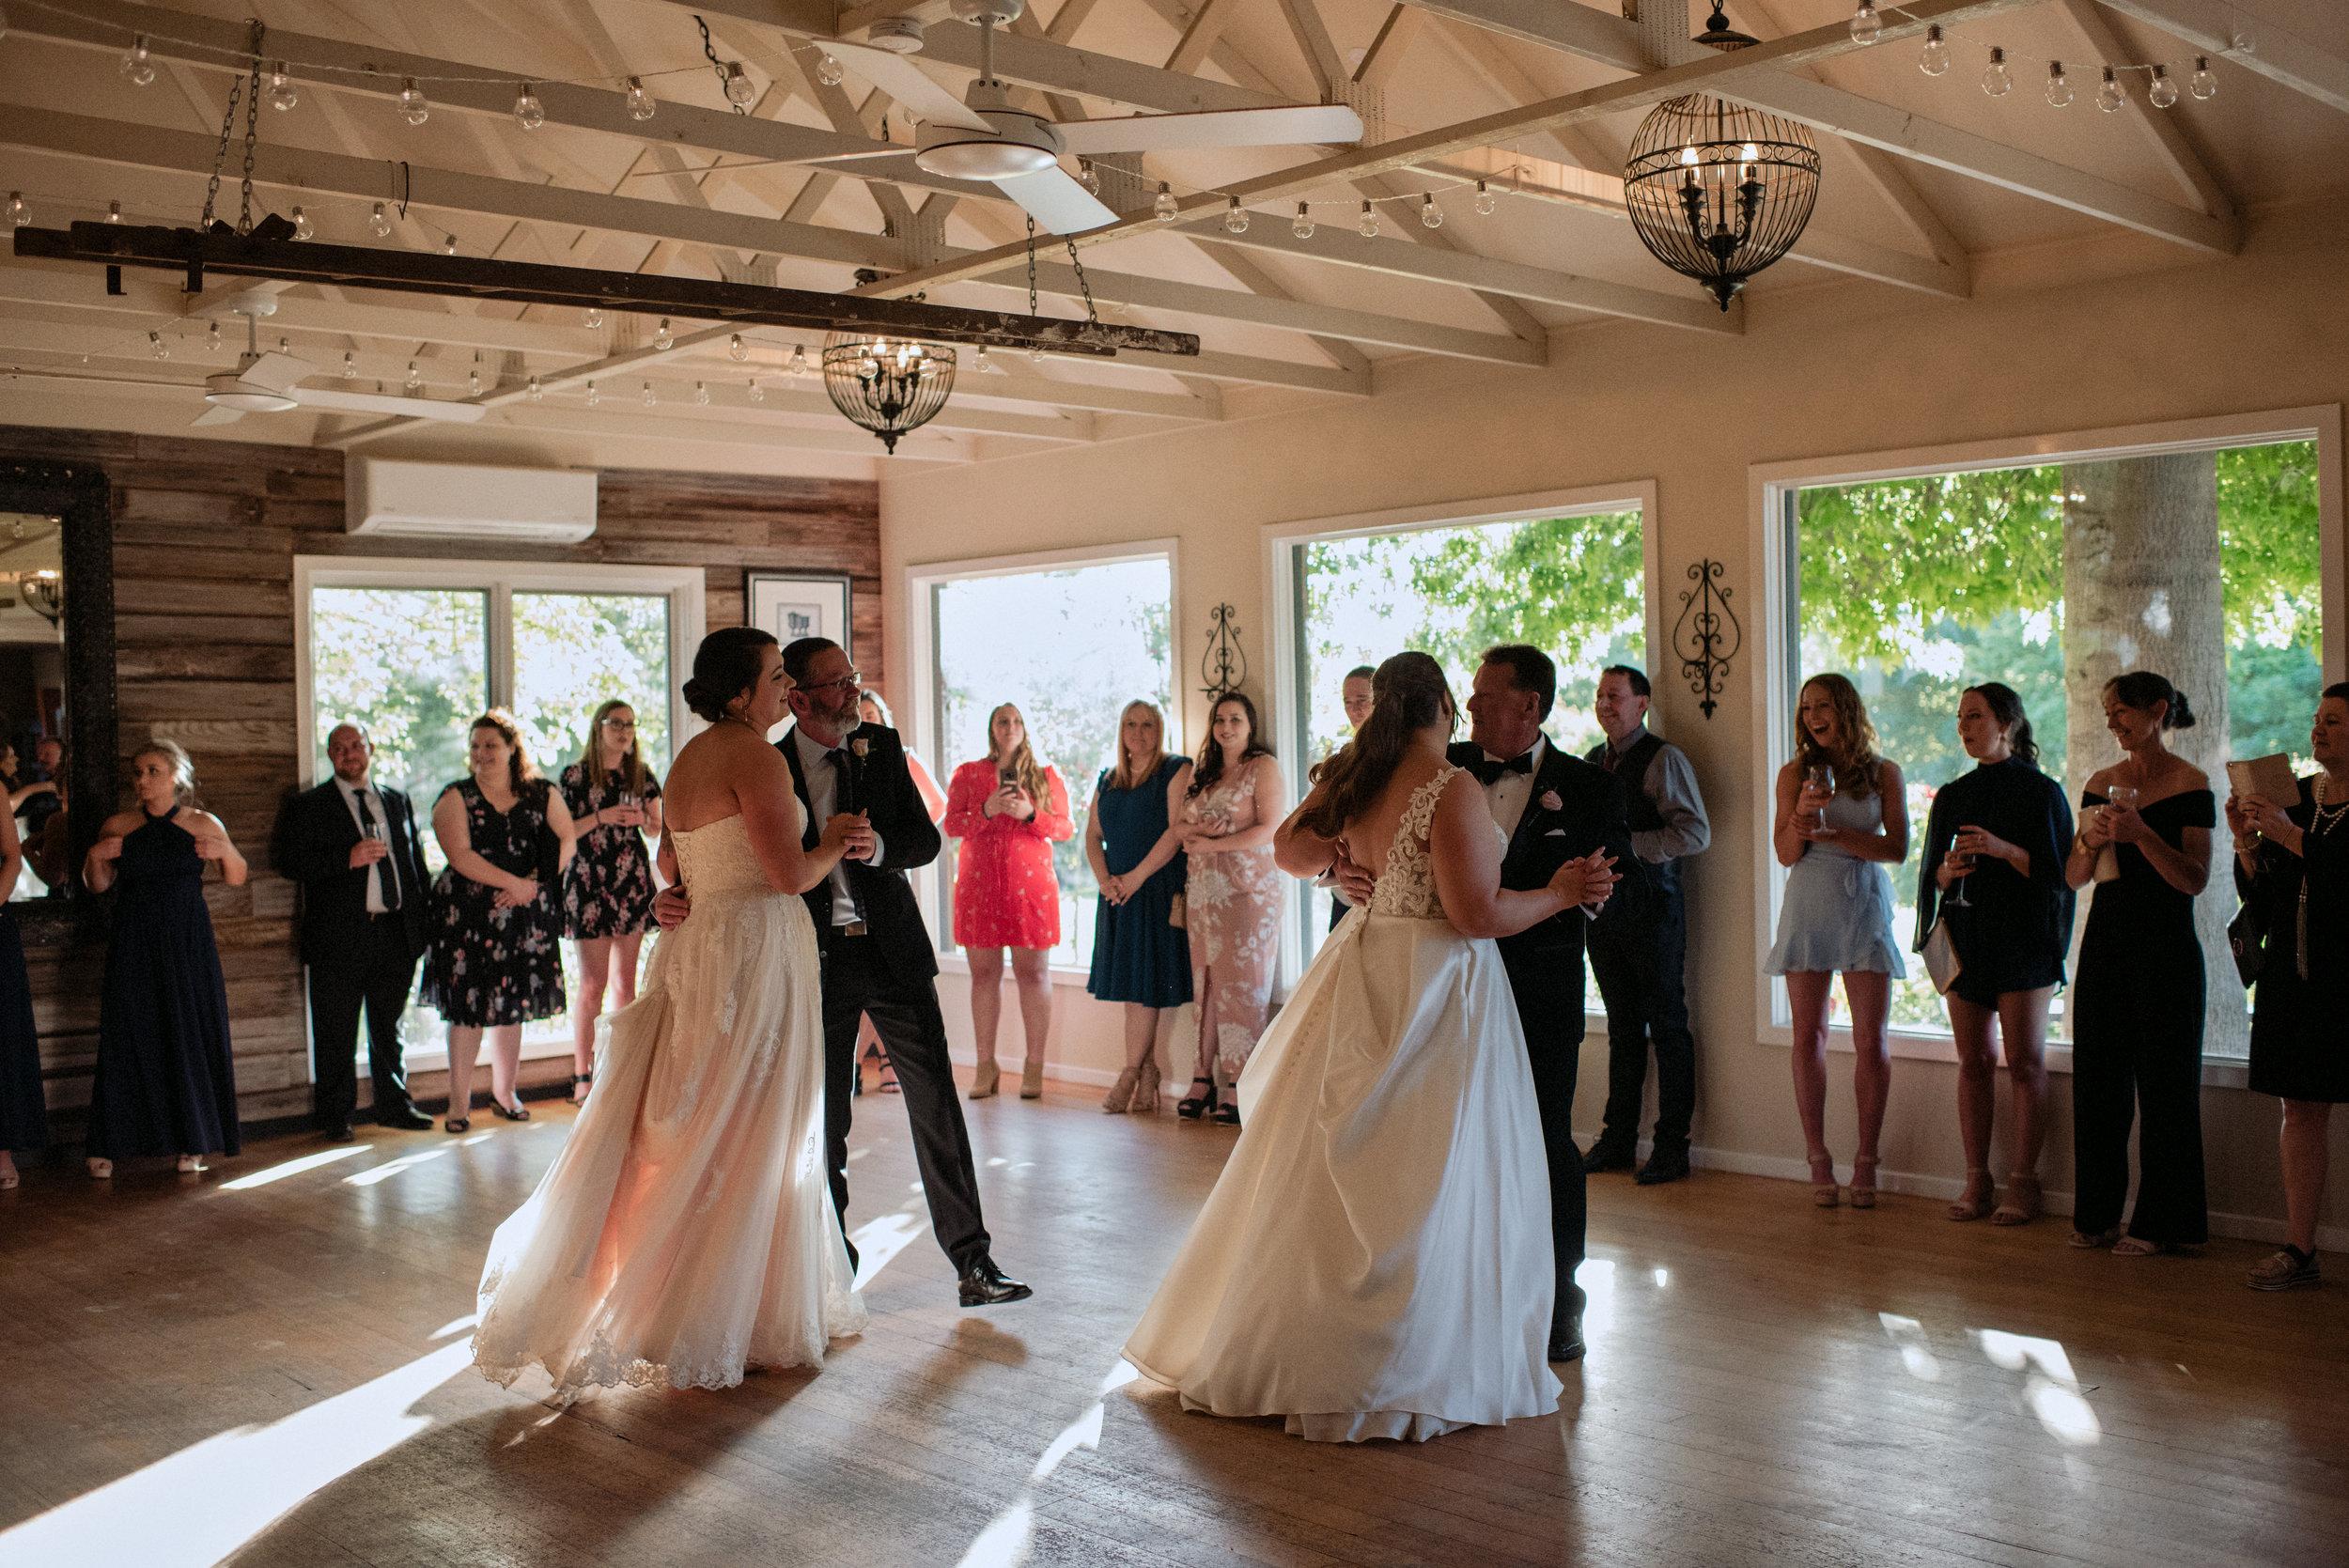 20181028_Abbey_Kate_Wedding-730-Edit-7.jpg